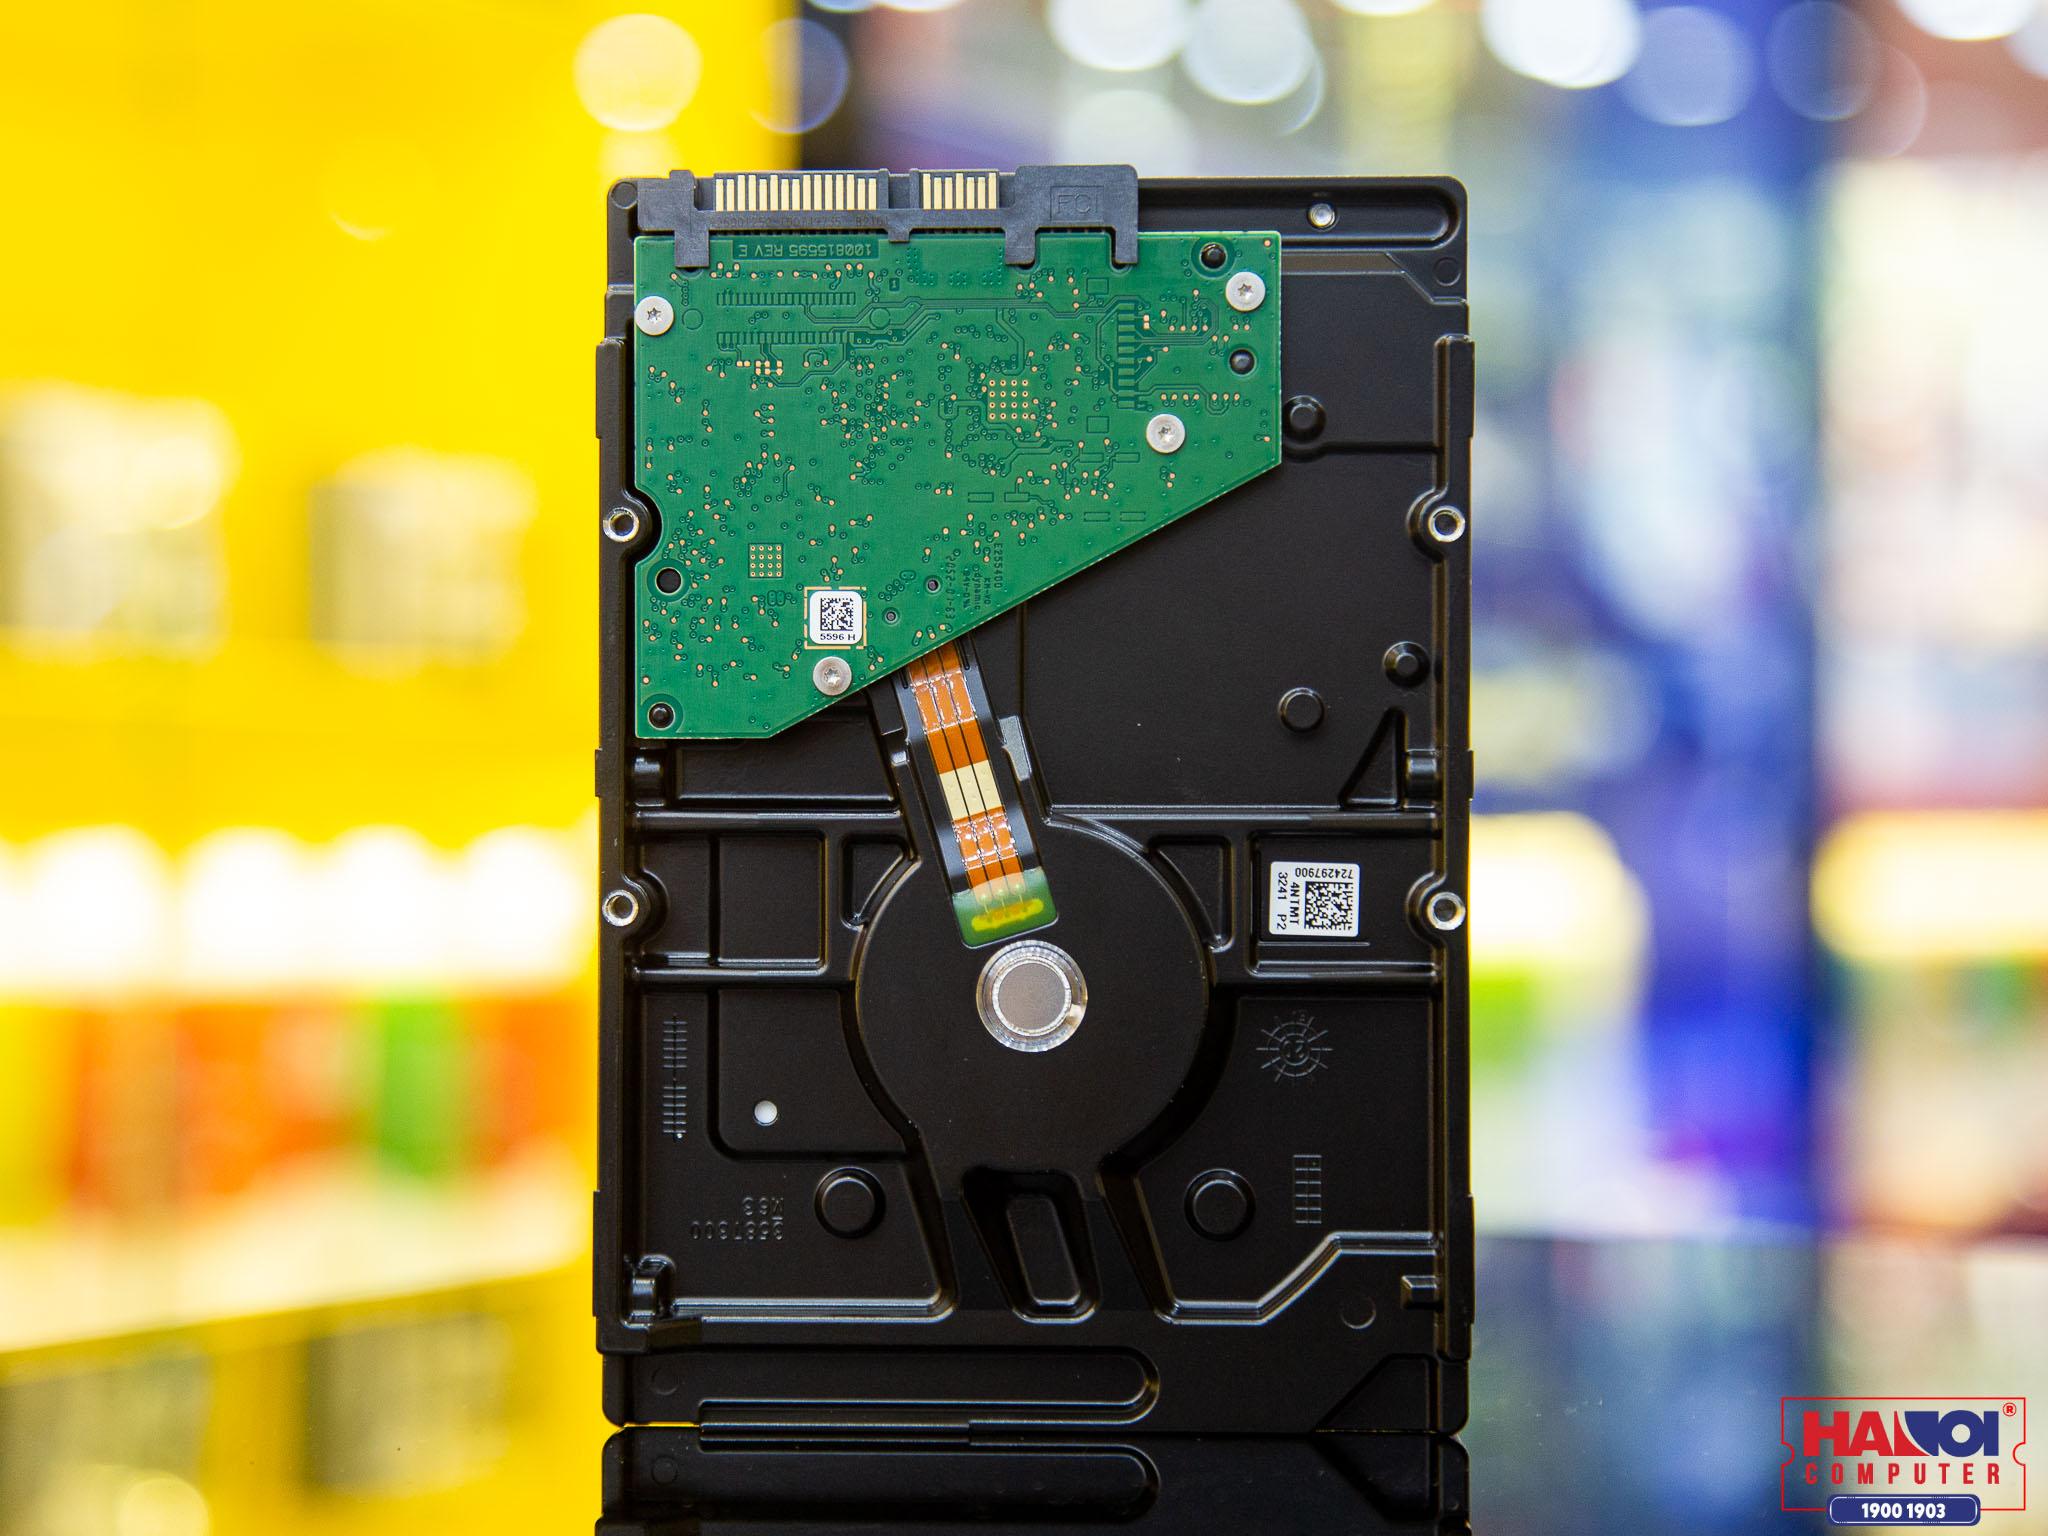 Ổ cứng HDD Seagate Barracuda 4TB 3.5 inch 5400RPM, SATA3, 256MB Cache (ST4000DM004)